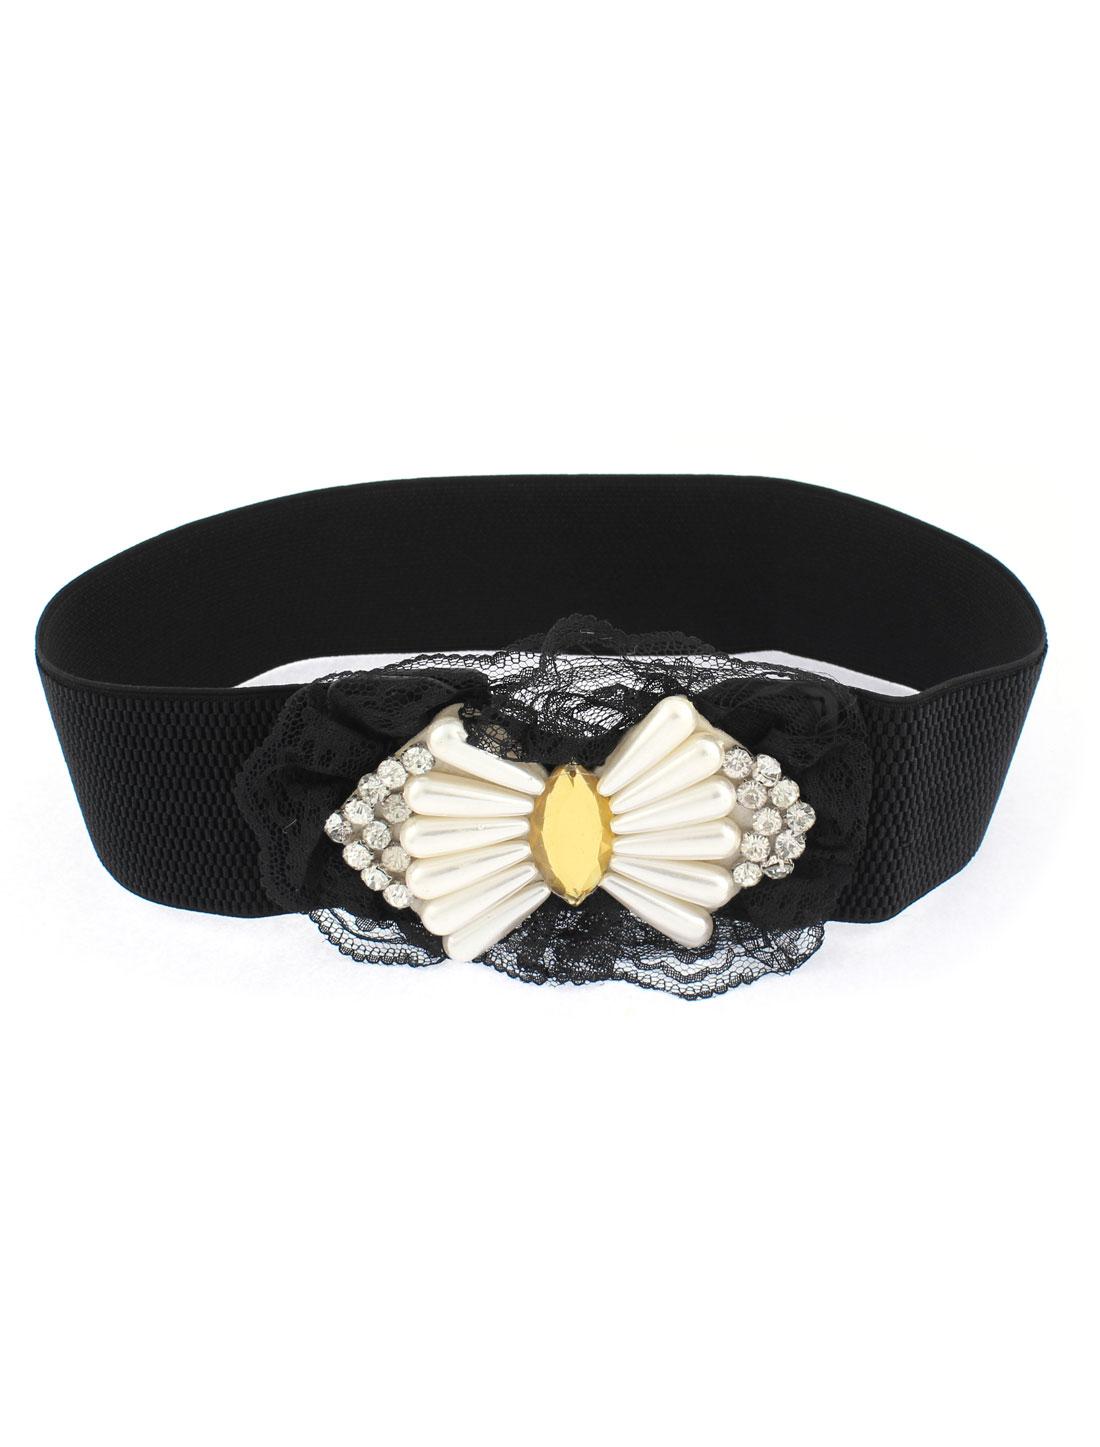 Adjustable Elastic Lace Detailing Waistband Waist Belt 6cm Width Black